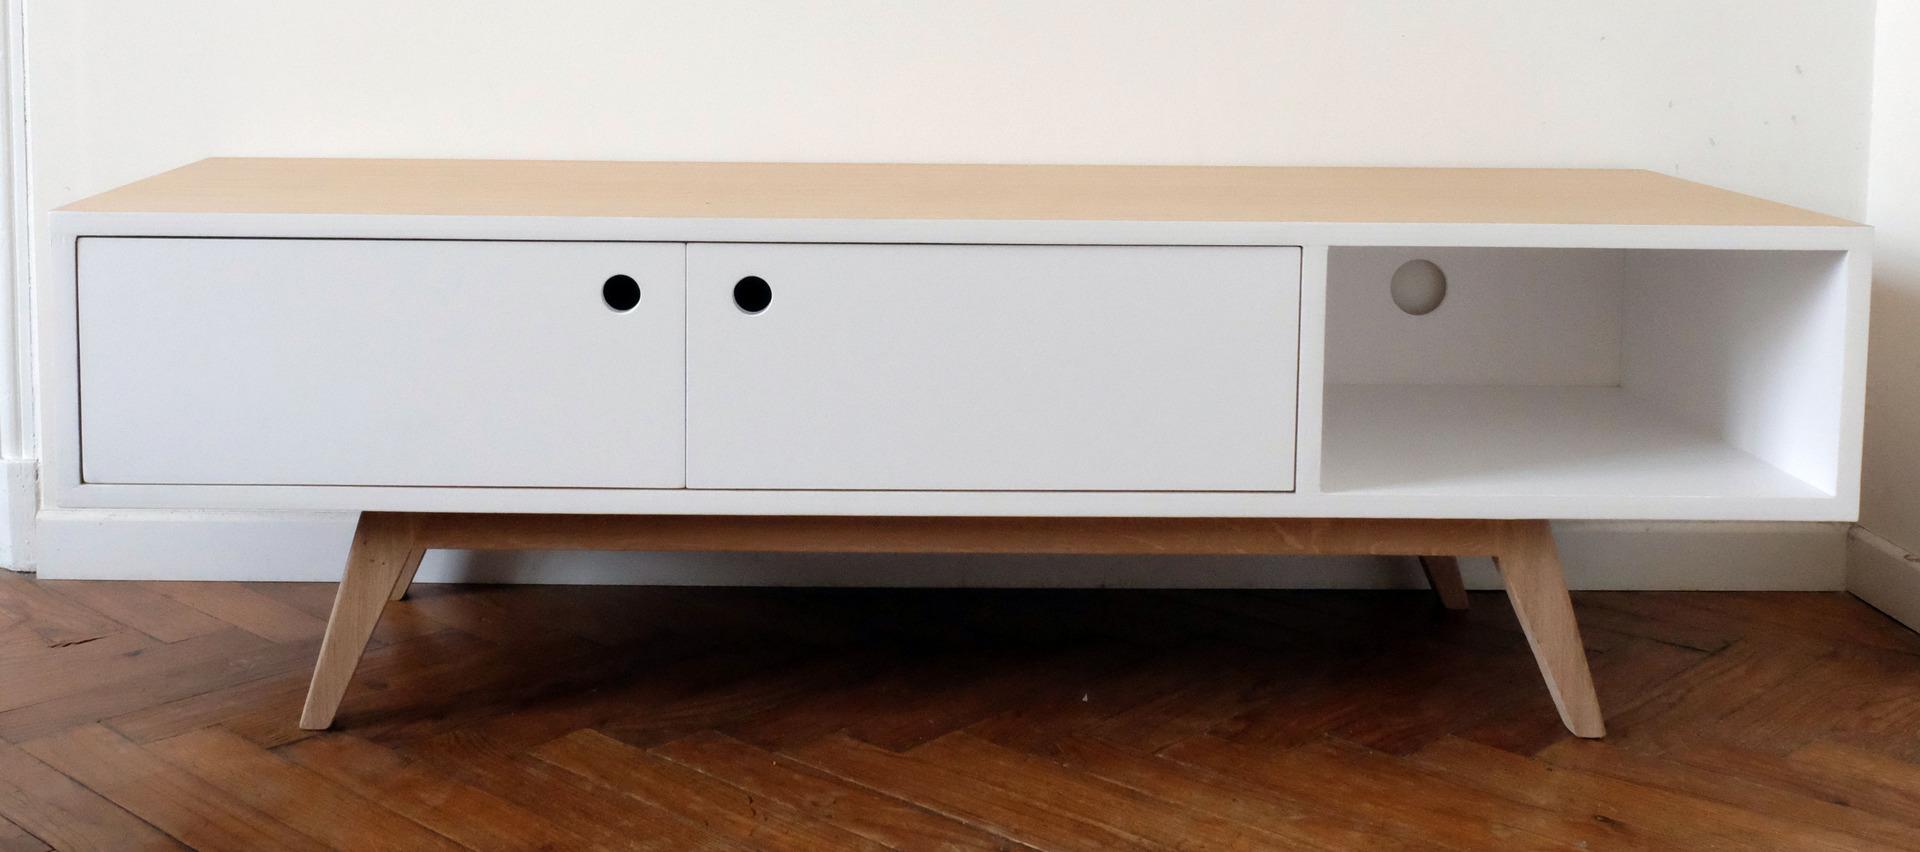 meubles tv scandinaves infini photo. Black Bedroom Furniture Sets. Home Design Ideas